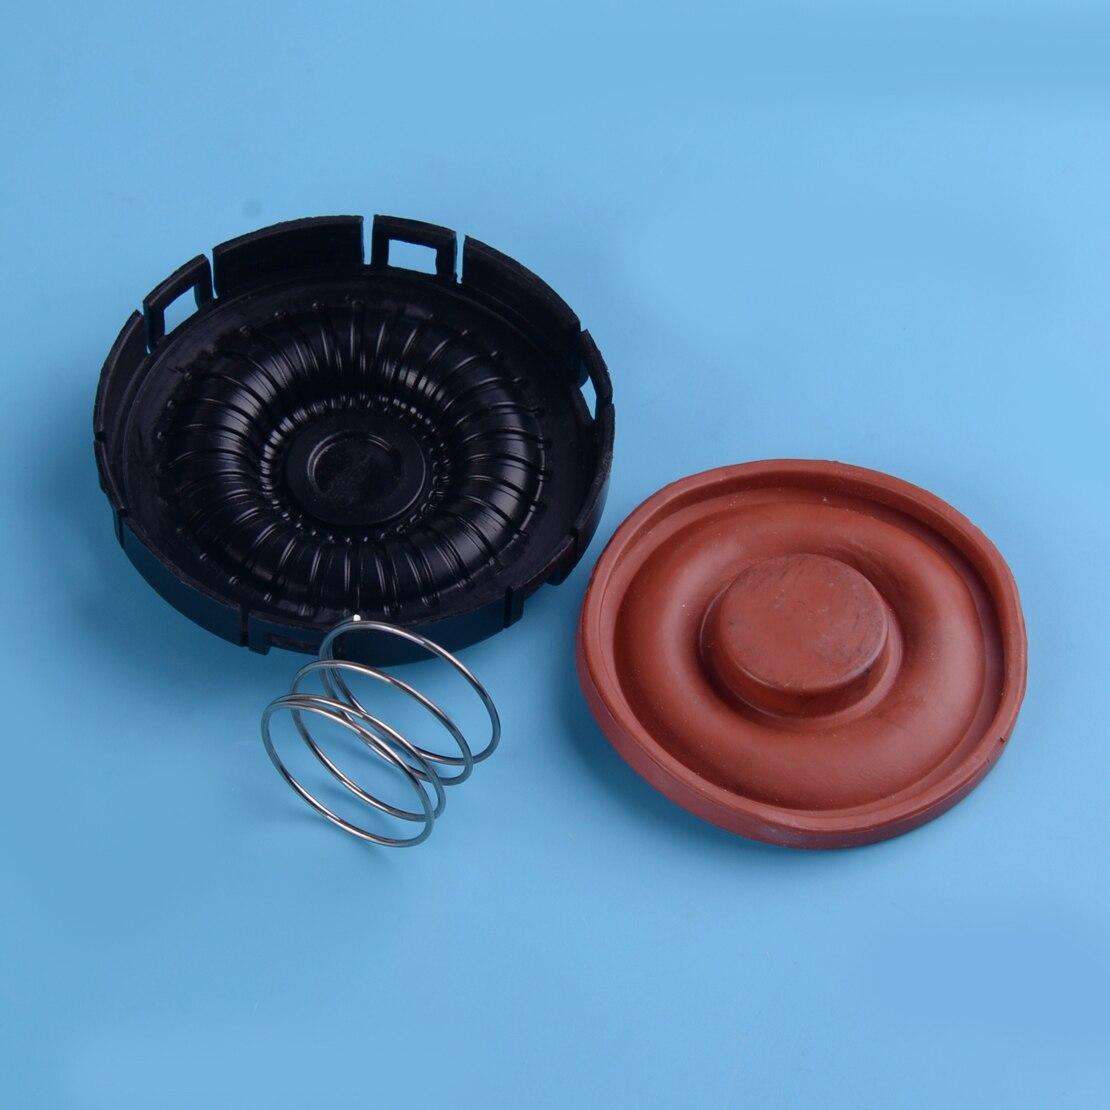 CITALL двигателя автомобиля прокладки клапанной крышки Кепки Ремкомплект 11127588412 Подходит для BMW N20 2.0L 228i 320i 328d 328i 428i 528i X1 X3 Z4